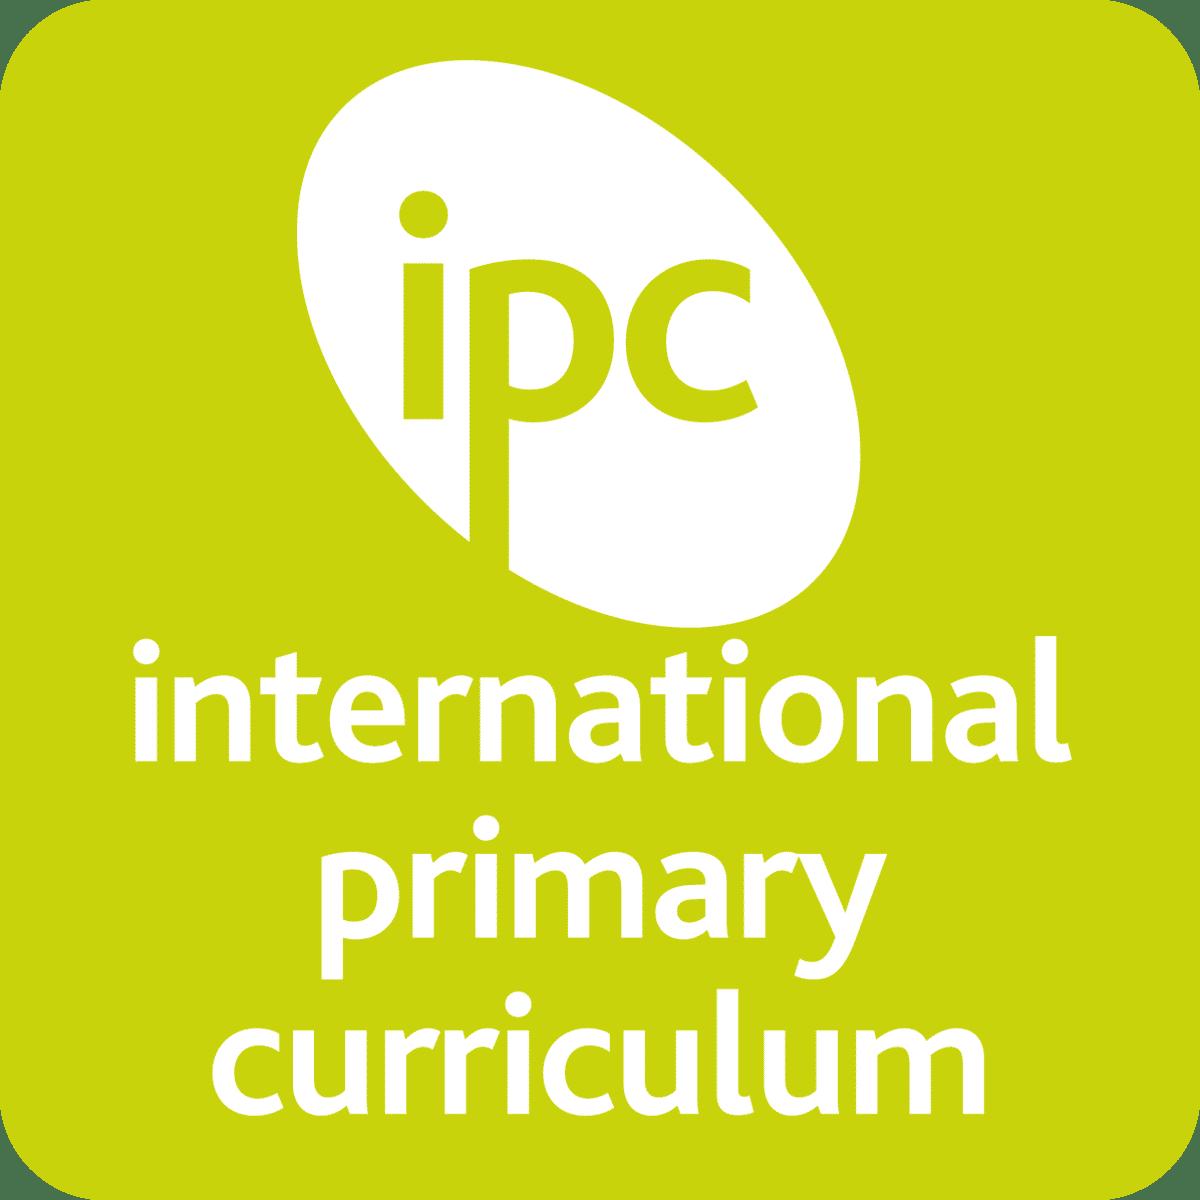 https://i1.wp.com/sophiahigh.school/wp-content/uploads/2020/08/IPC-Logo-PNG.png?w=1920